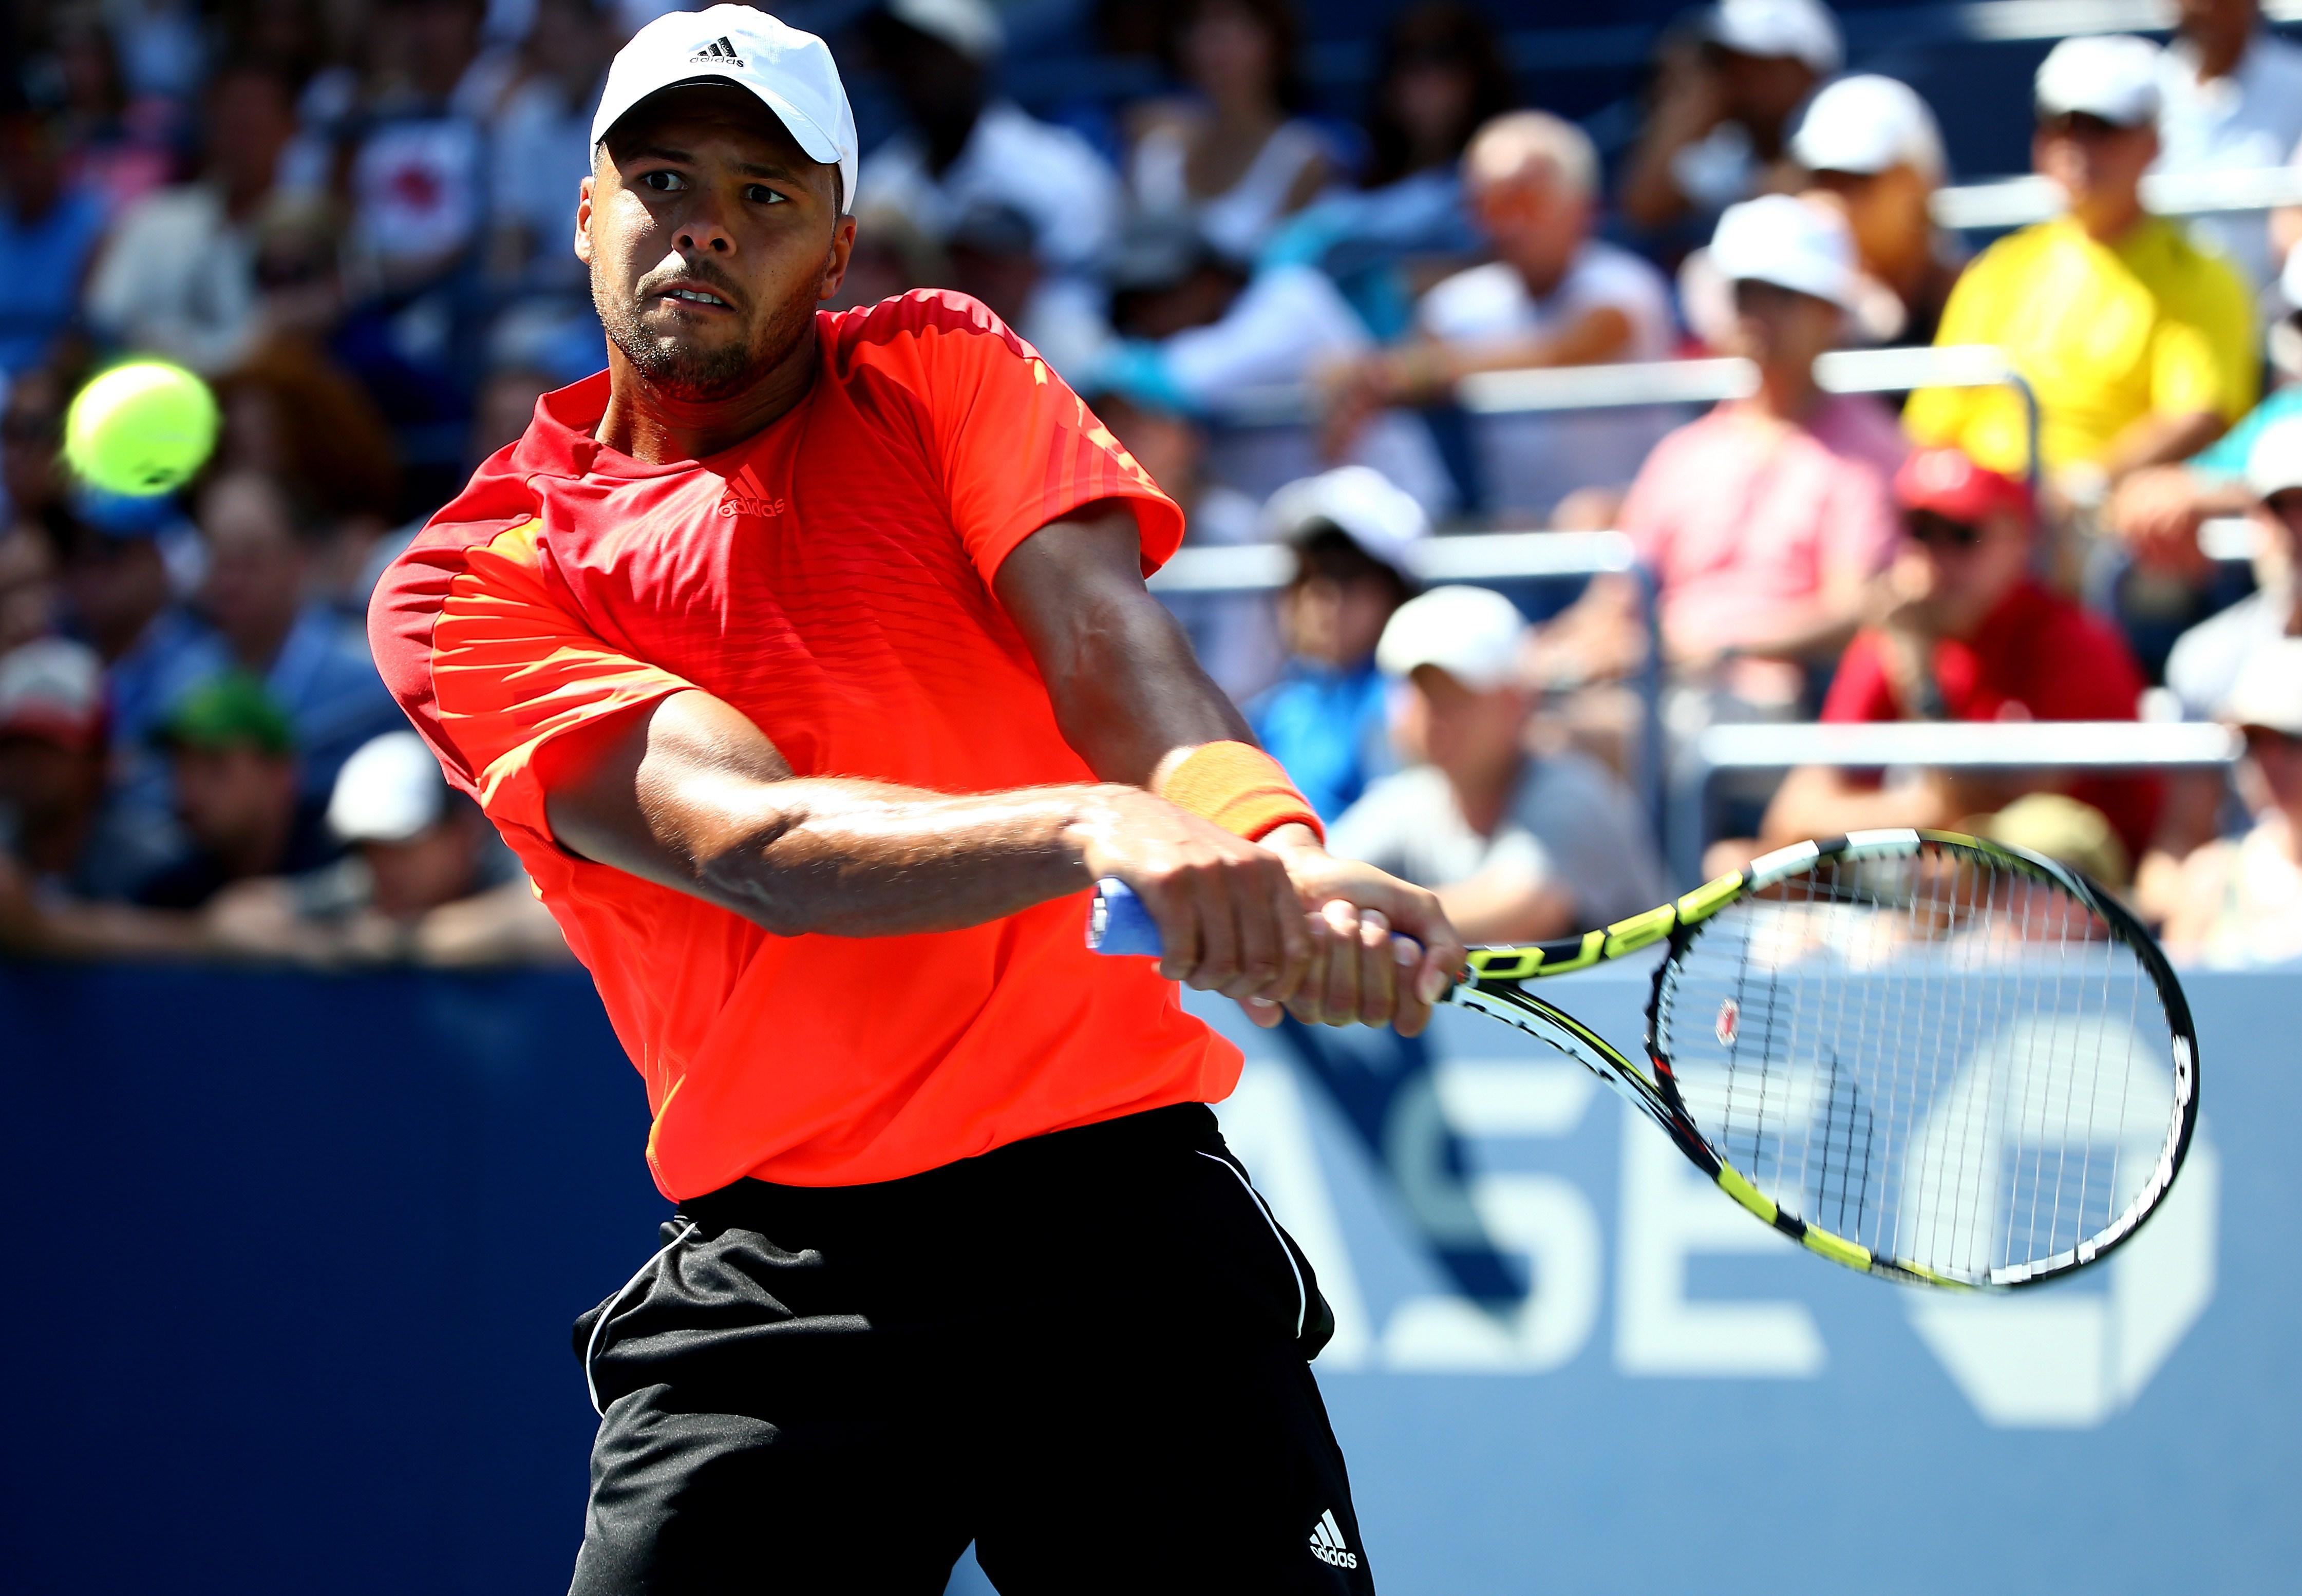 Tennis - US Open - Tsonga tranquille, Llodra triste derni�re